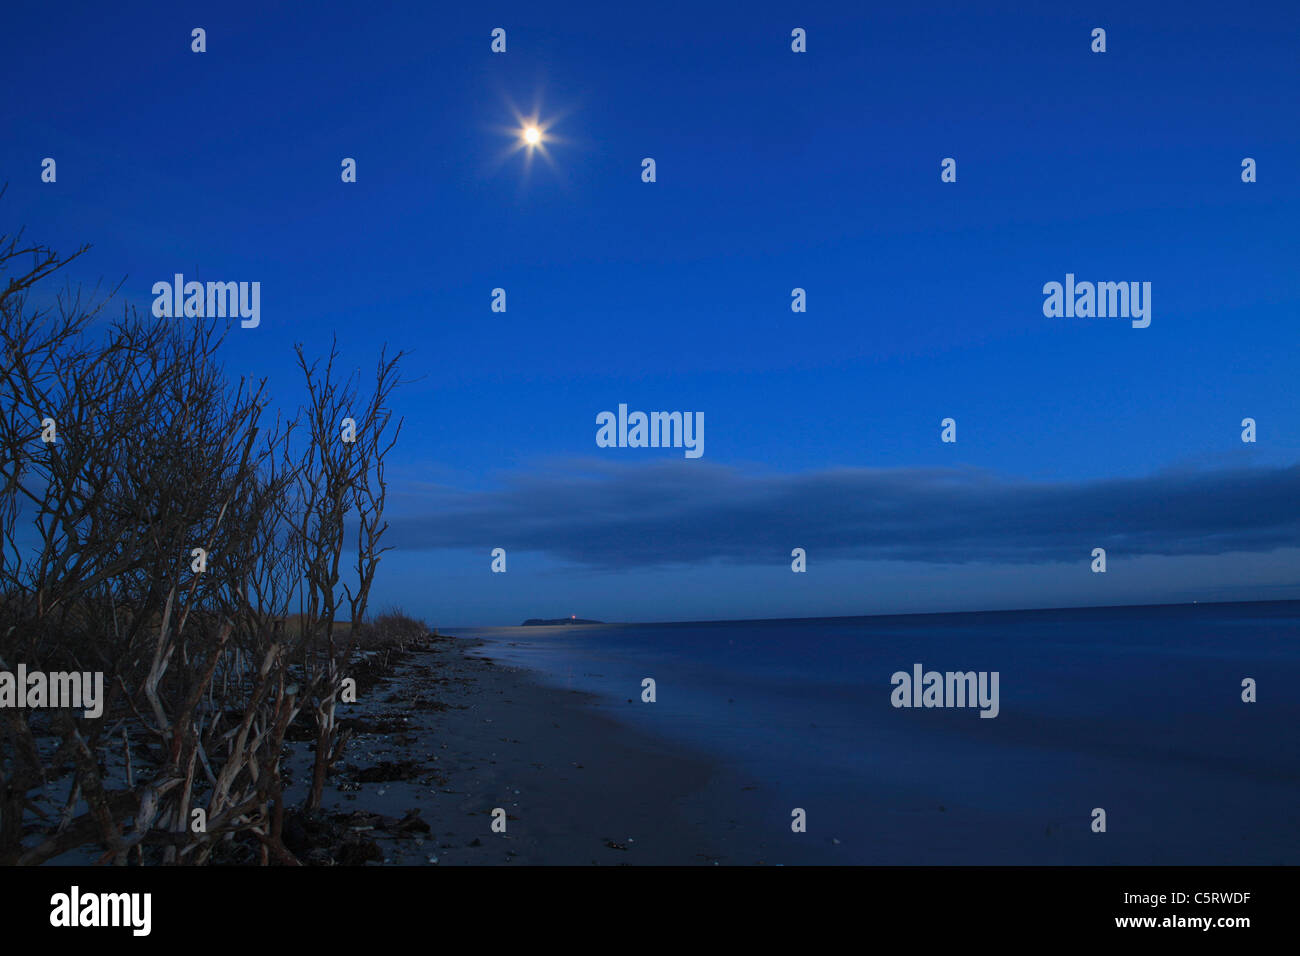 Denmark, Kattegat, Ebeltoft, Baltic Sea, View of beach near sea with moon at night - Stock Image